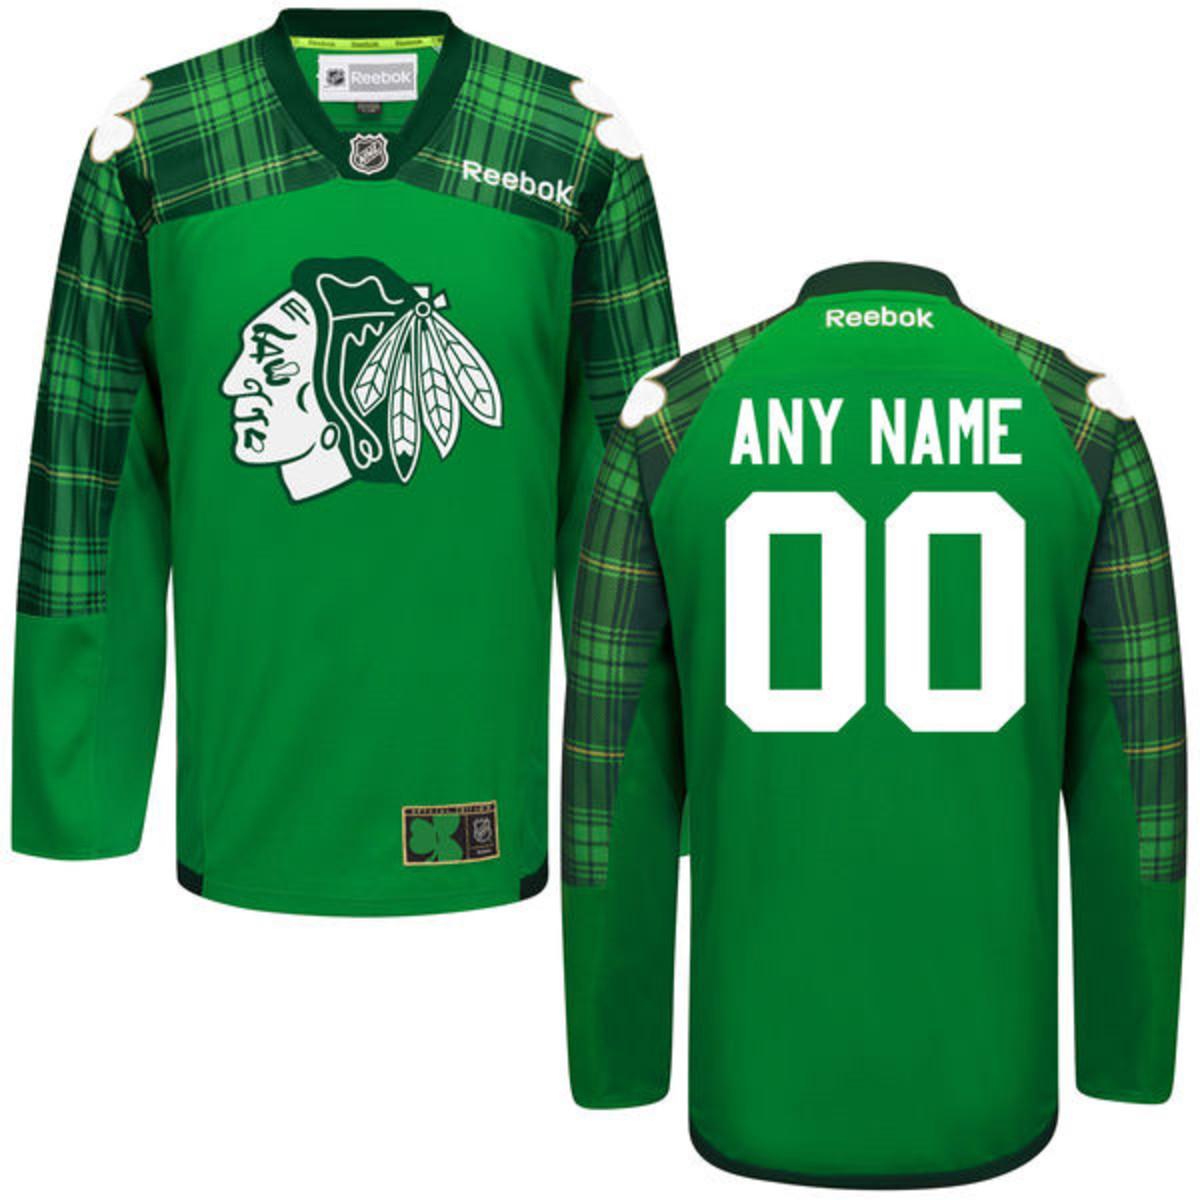 blackhawks-nhl-st-patricks-day-jersey.jpg